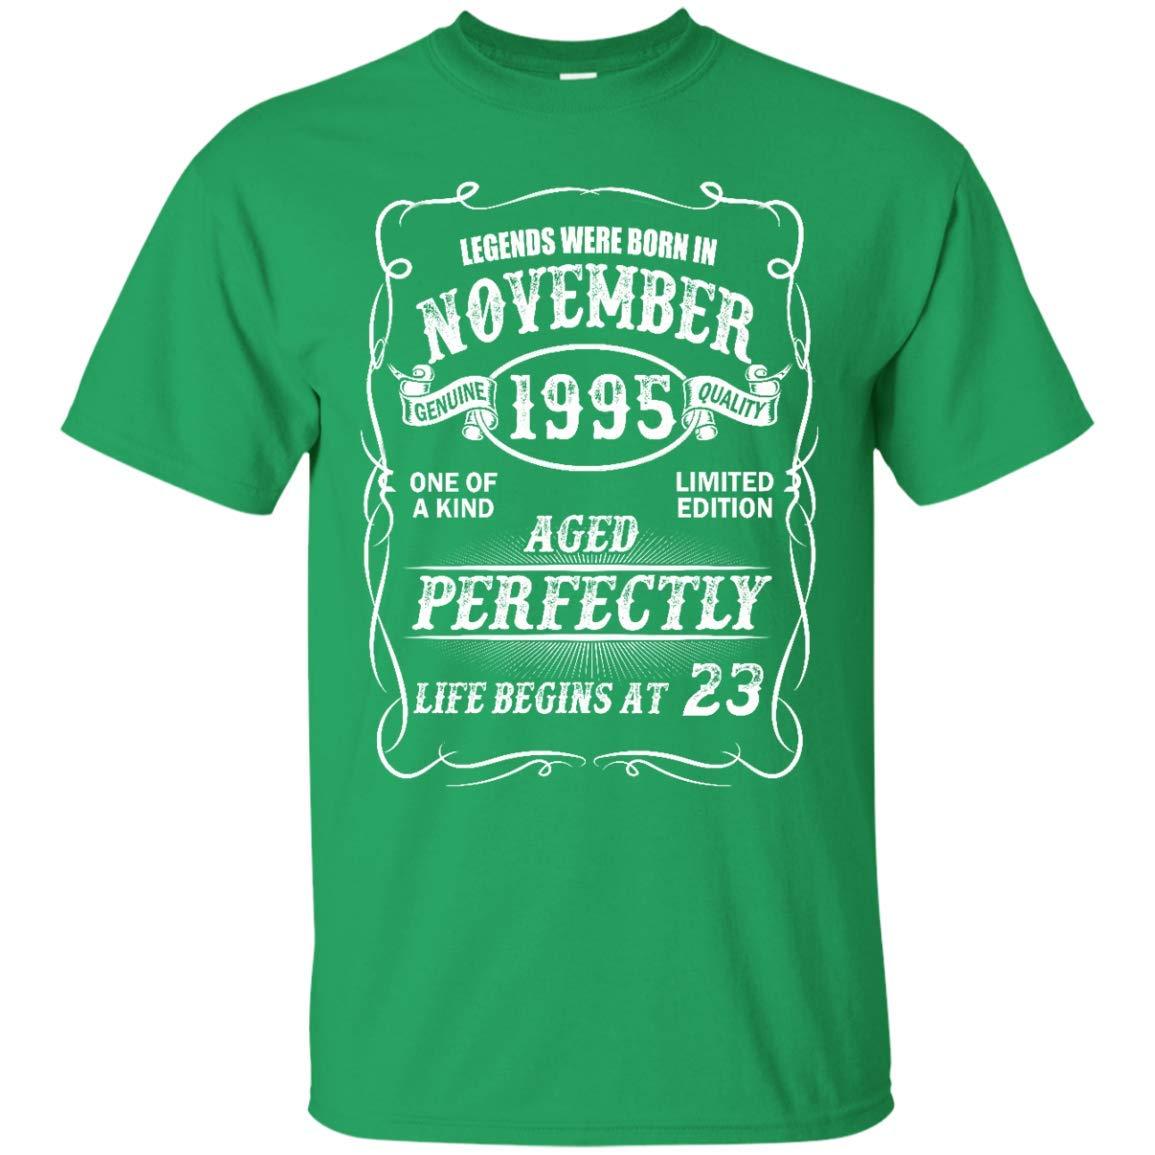 Awesome Shirts Funny Legends November 1995 Life Begins at 23